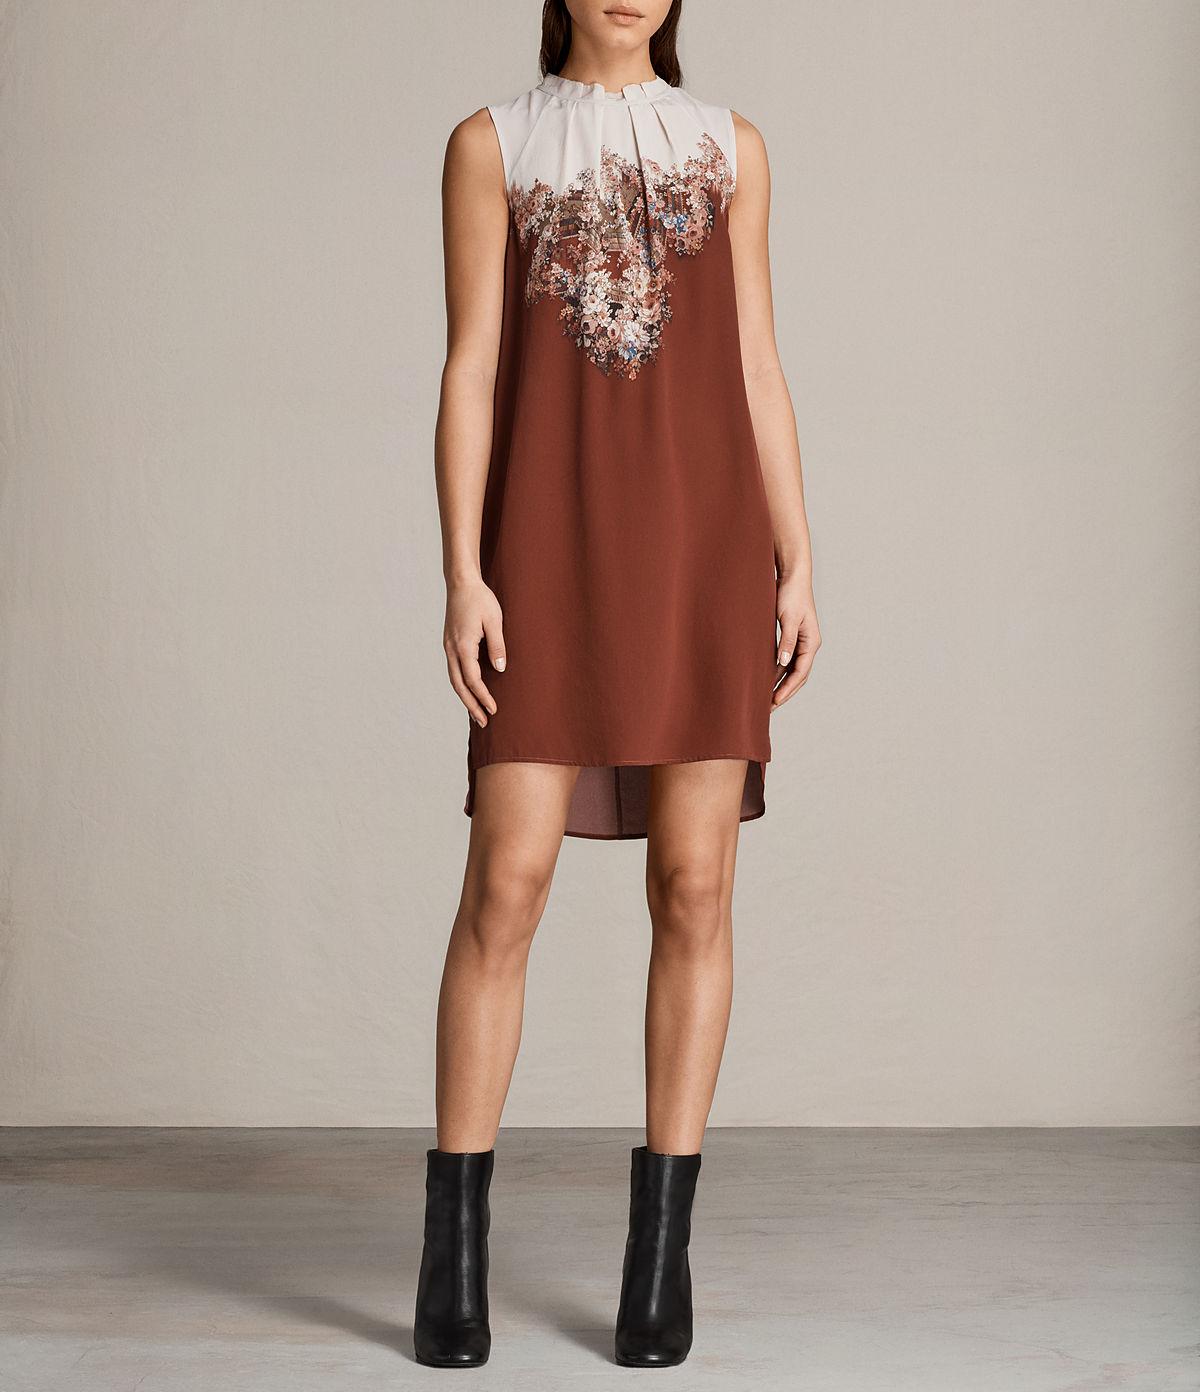 jay-clement-dress